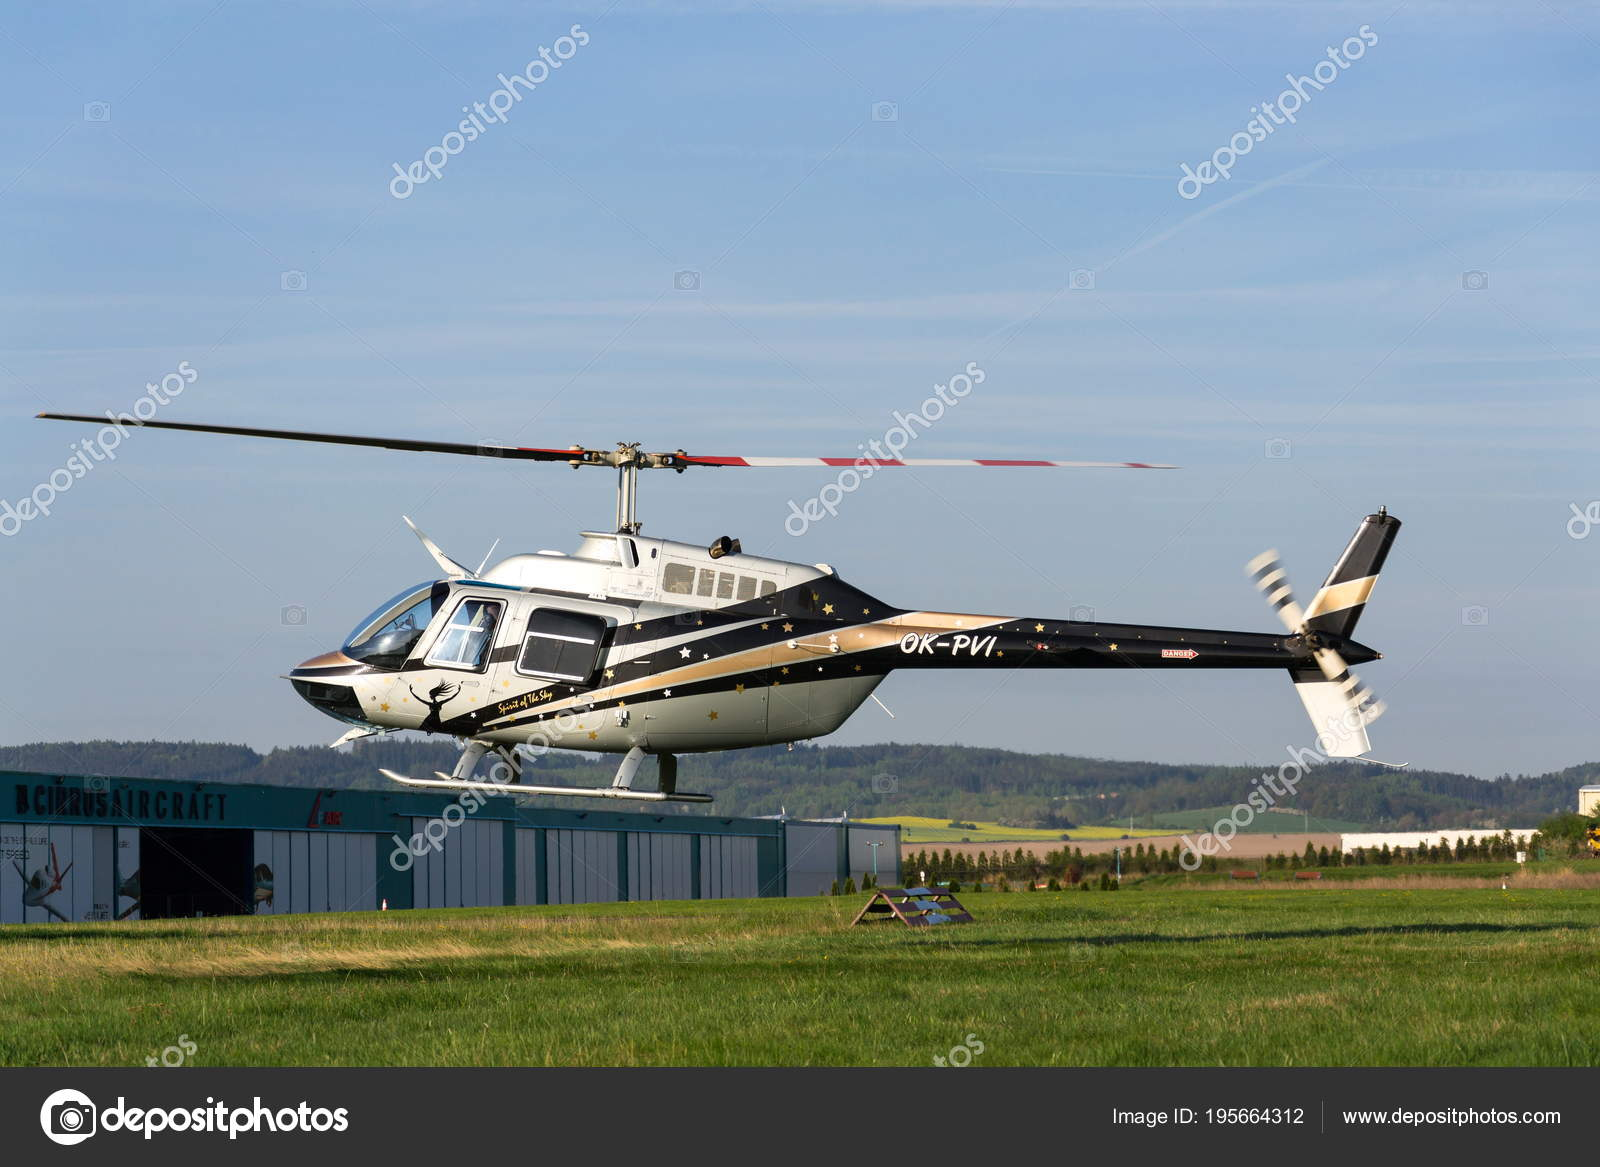 Elicottero Jet Ranger : Bell jet ranger elicottero foto immagine stock alamy